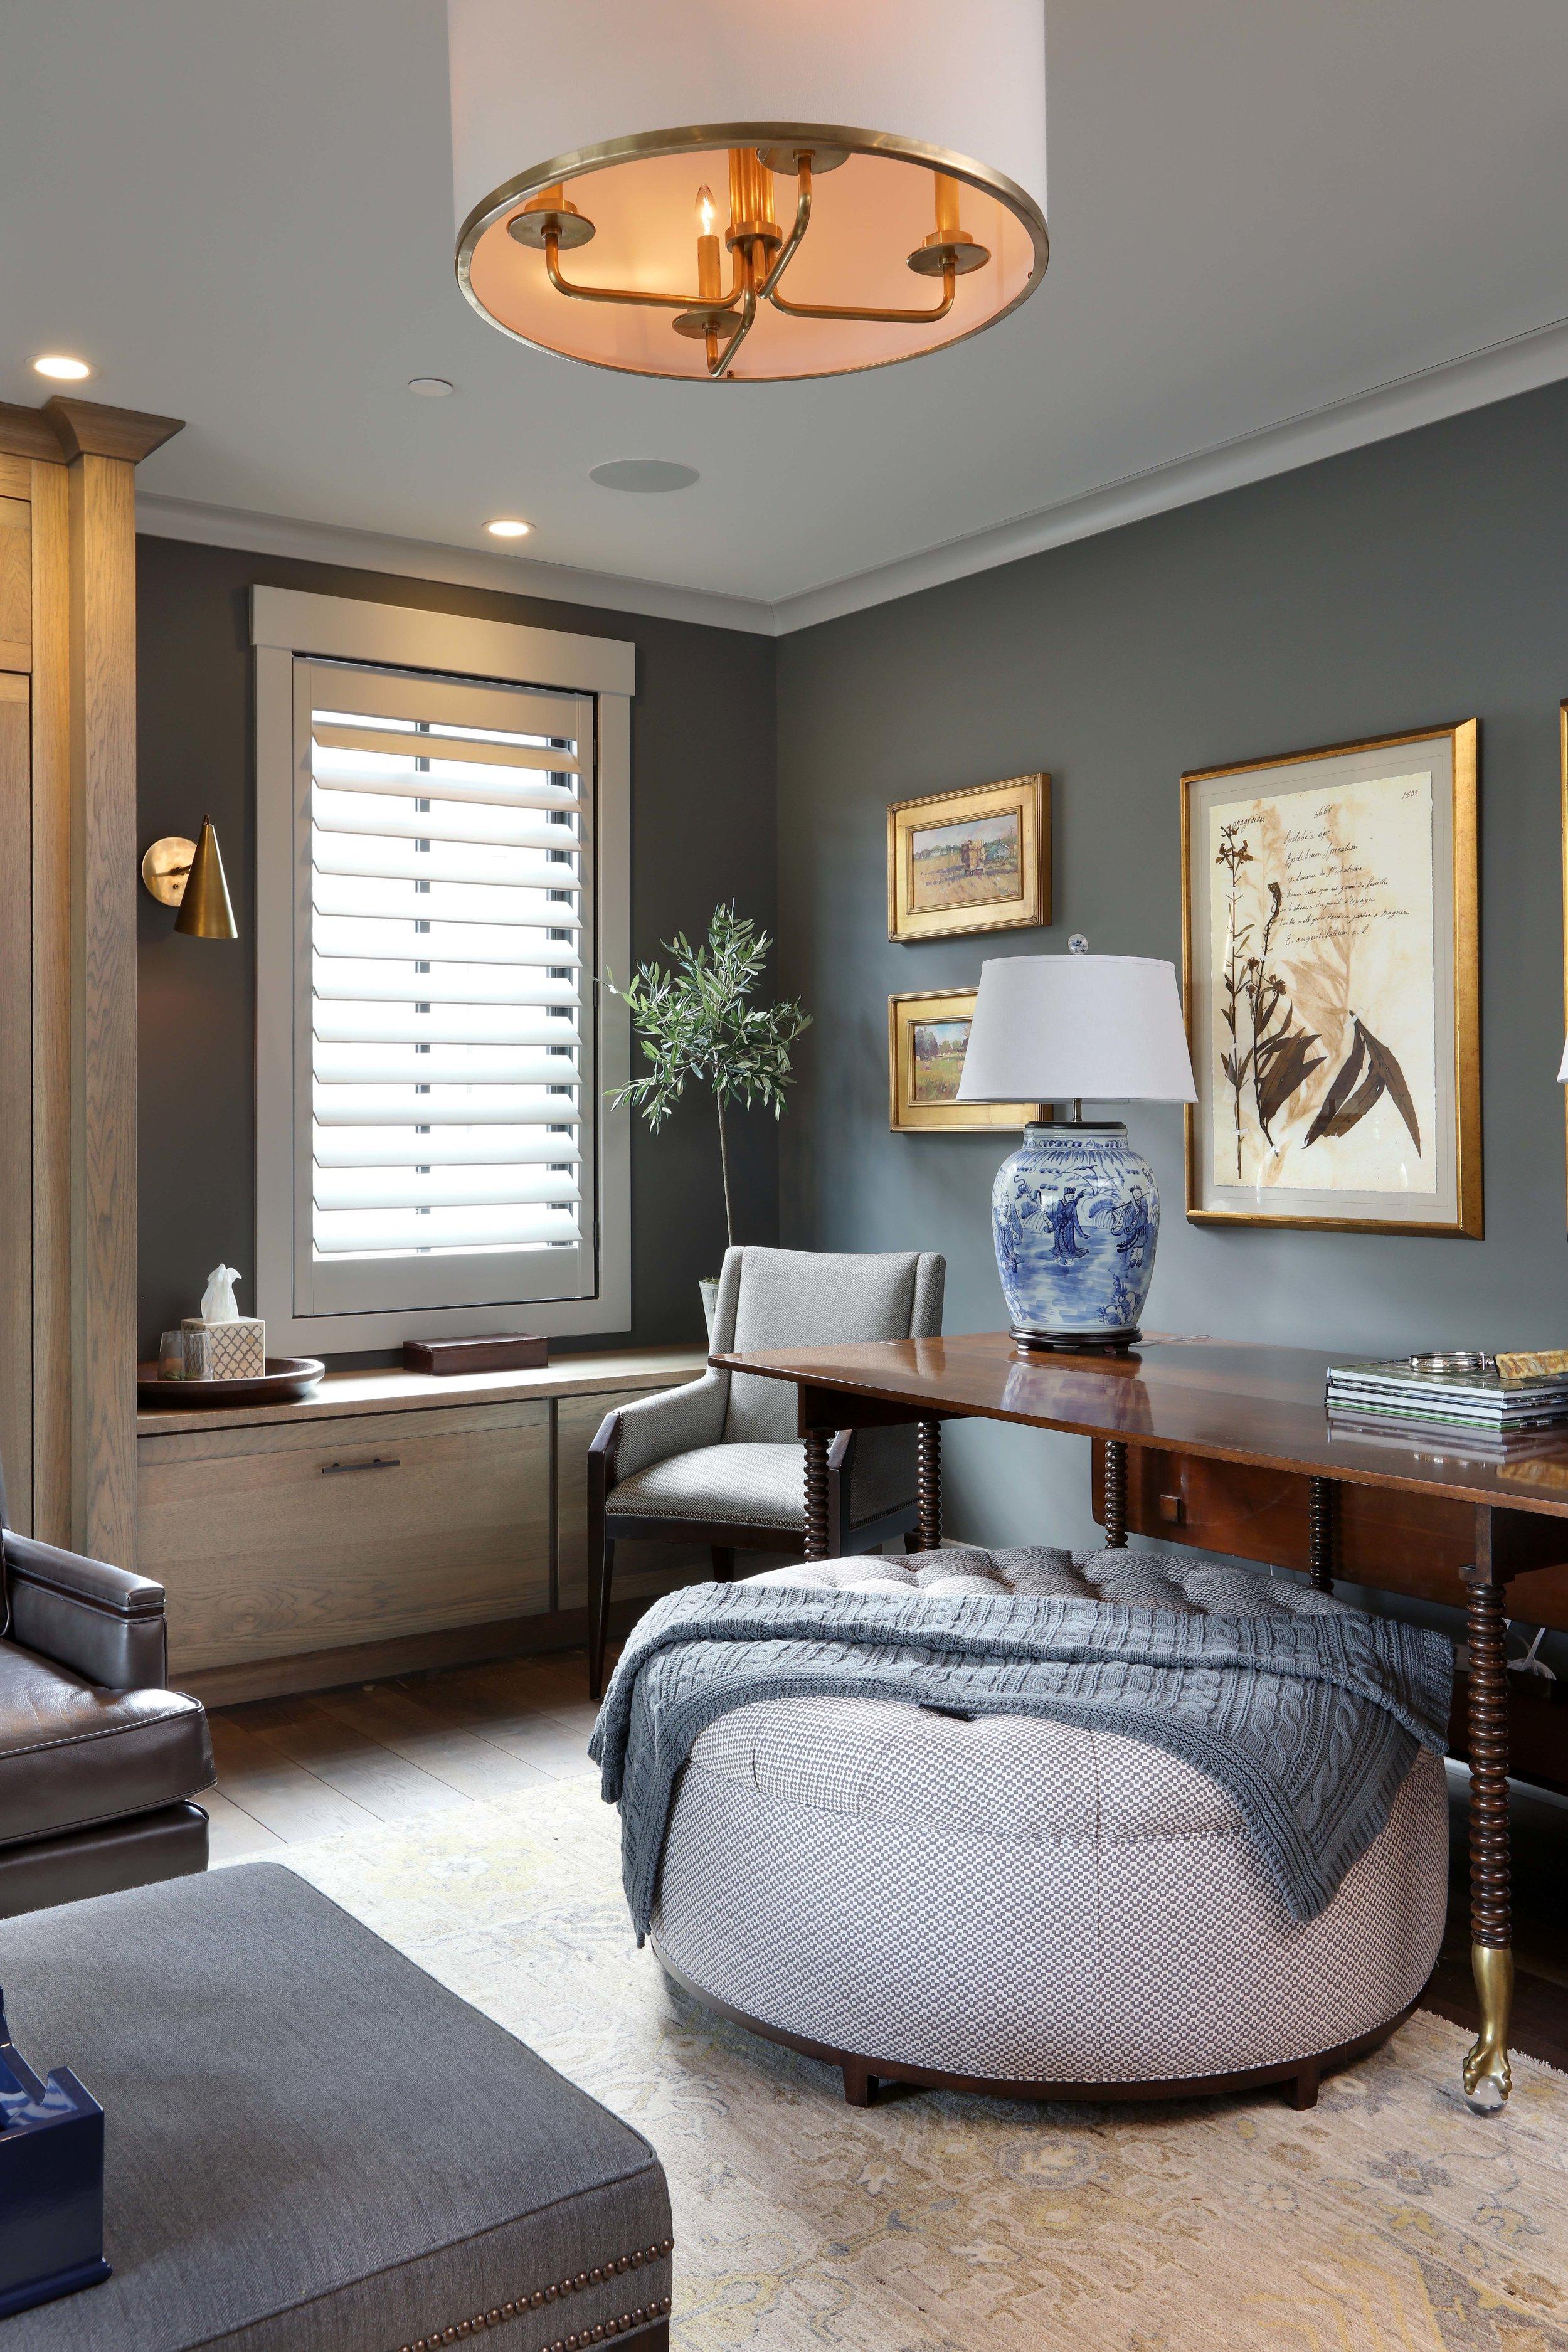 Vision-Interiors-Visbeen-Showroom-Grand-Rapids-Flex-Room-Details.jpg